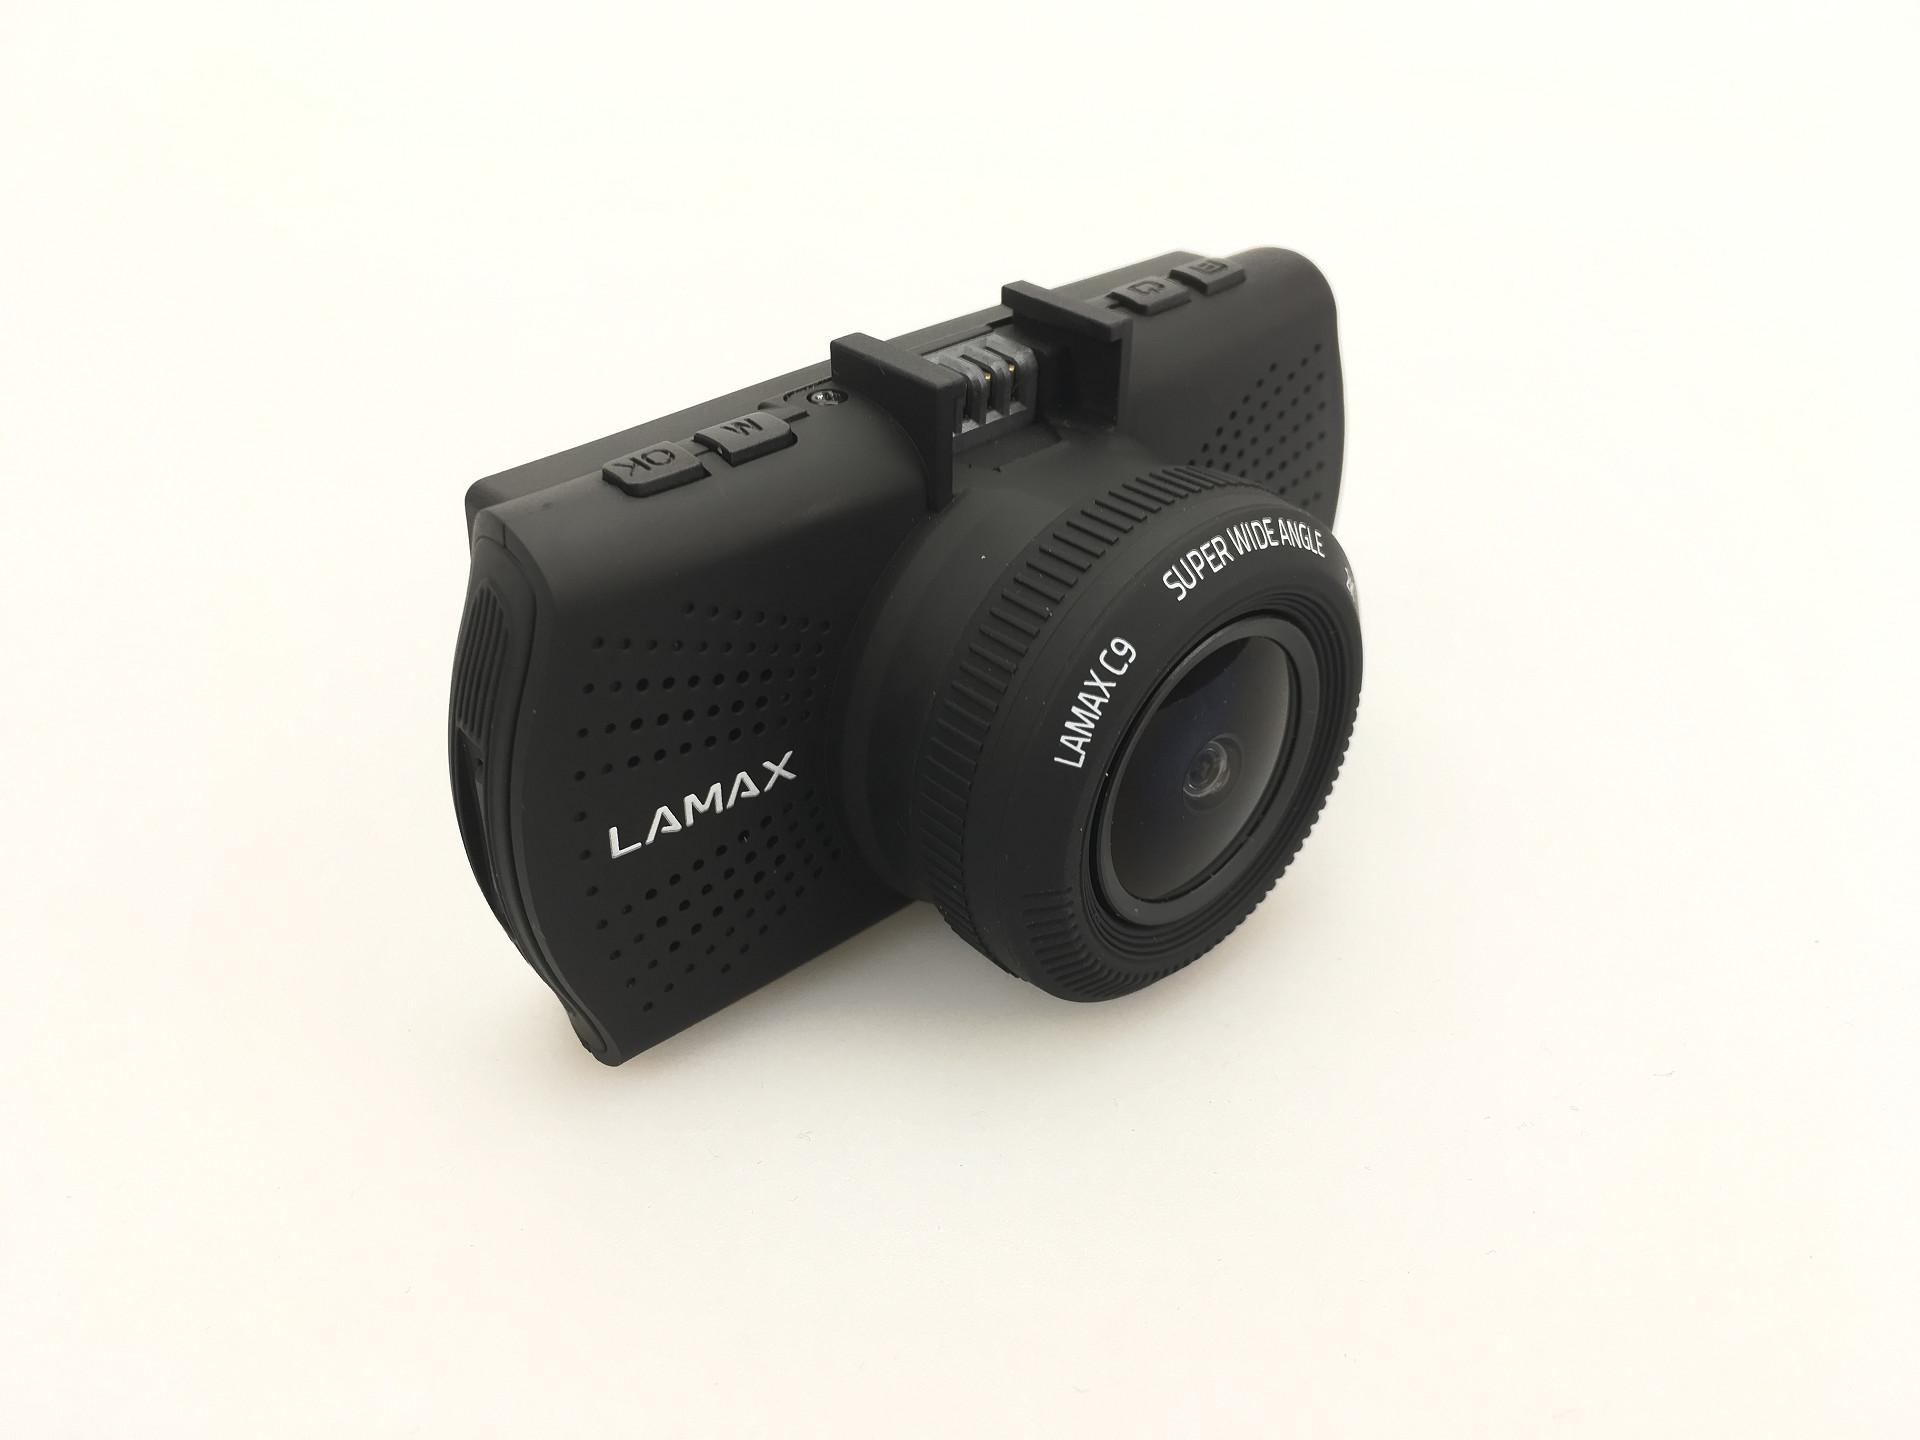 Recenze LAMAX C9 - fotka 7